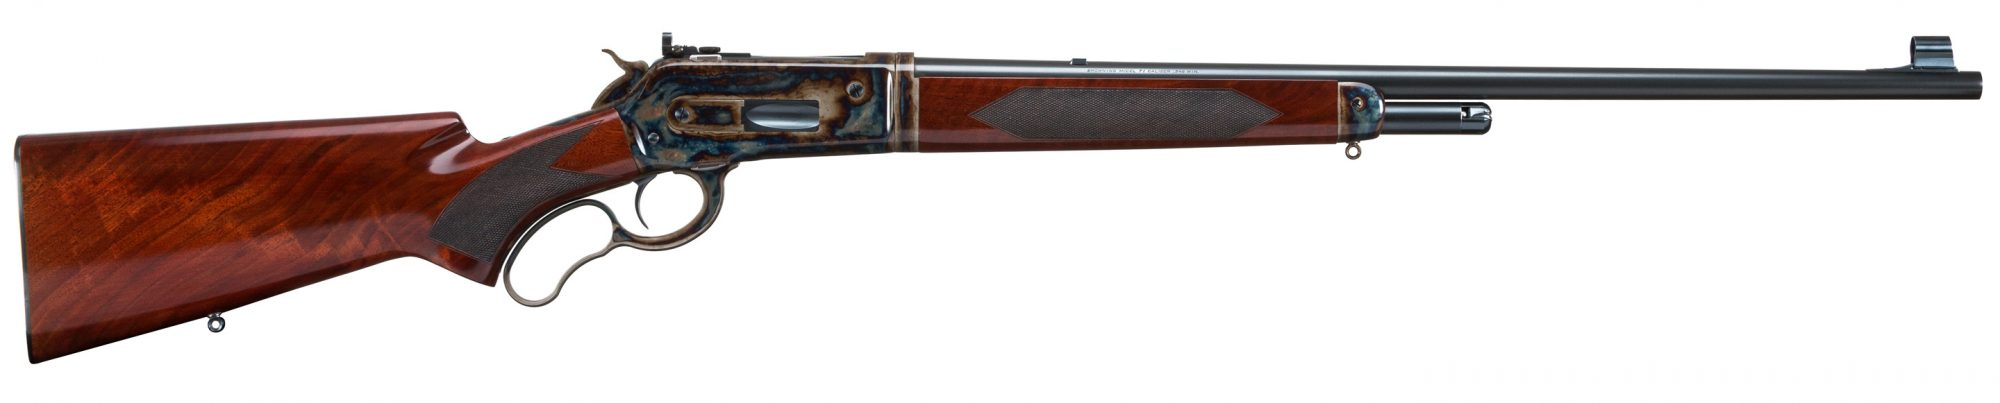 47C Browing Model 71 01850PR1R7